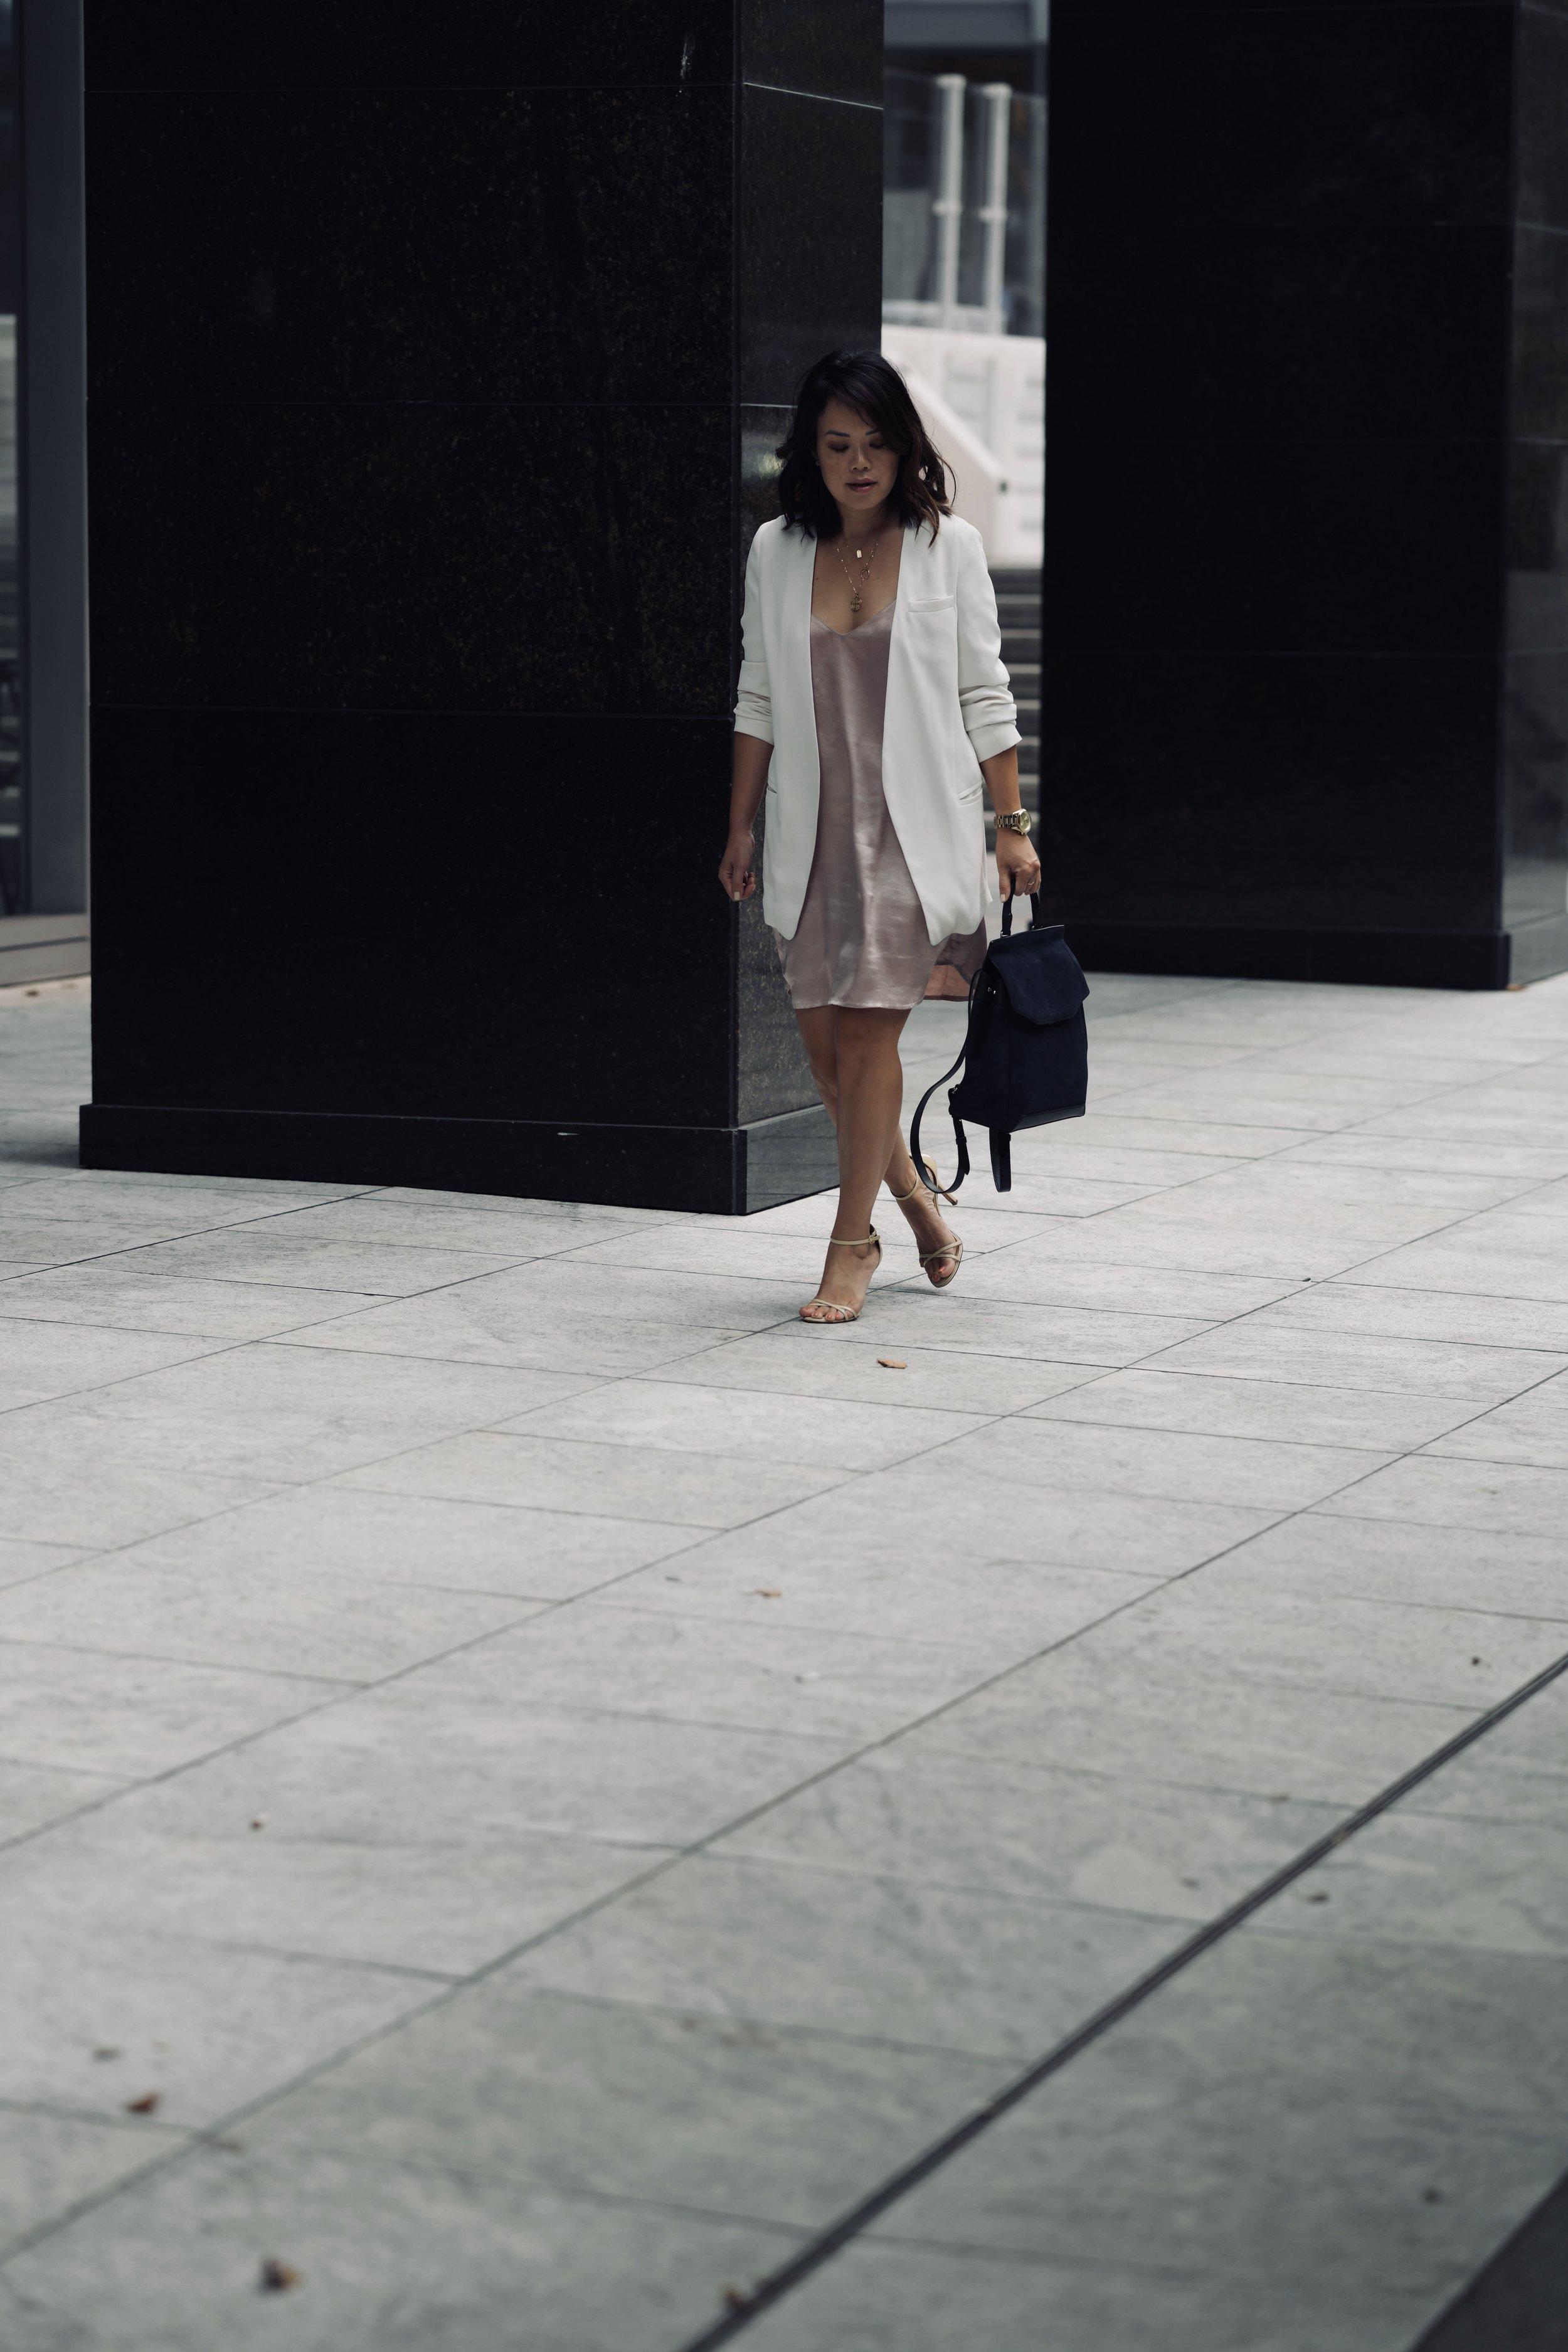 Downtown Slip Dress (24 of 31).jpg